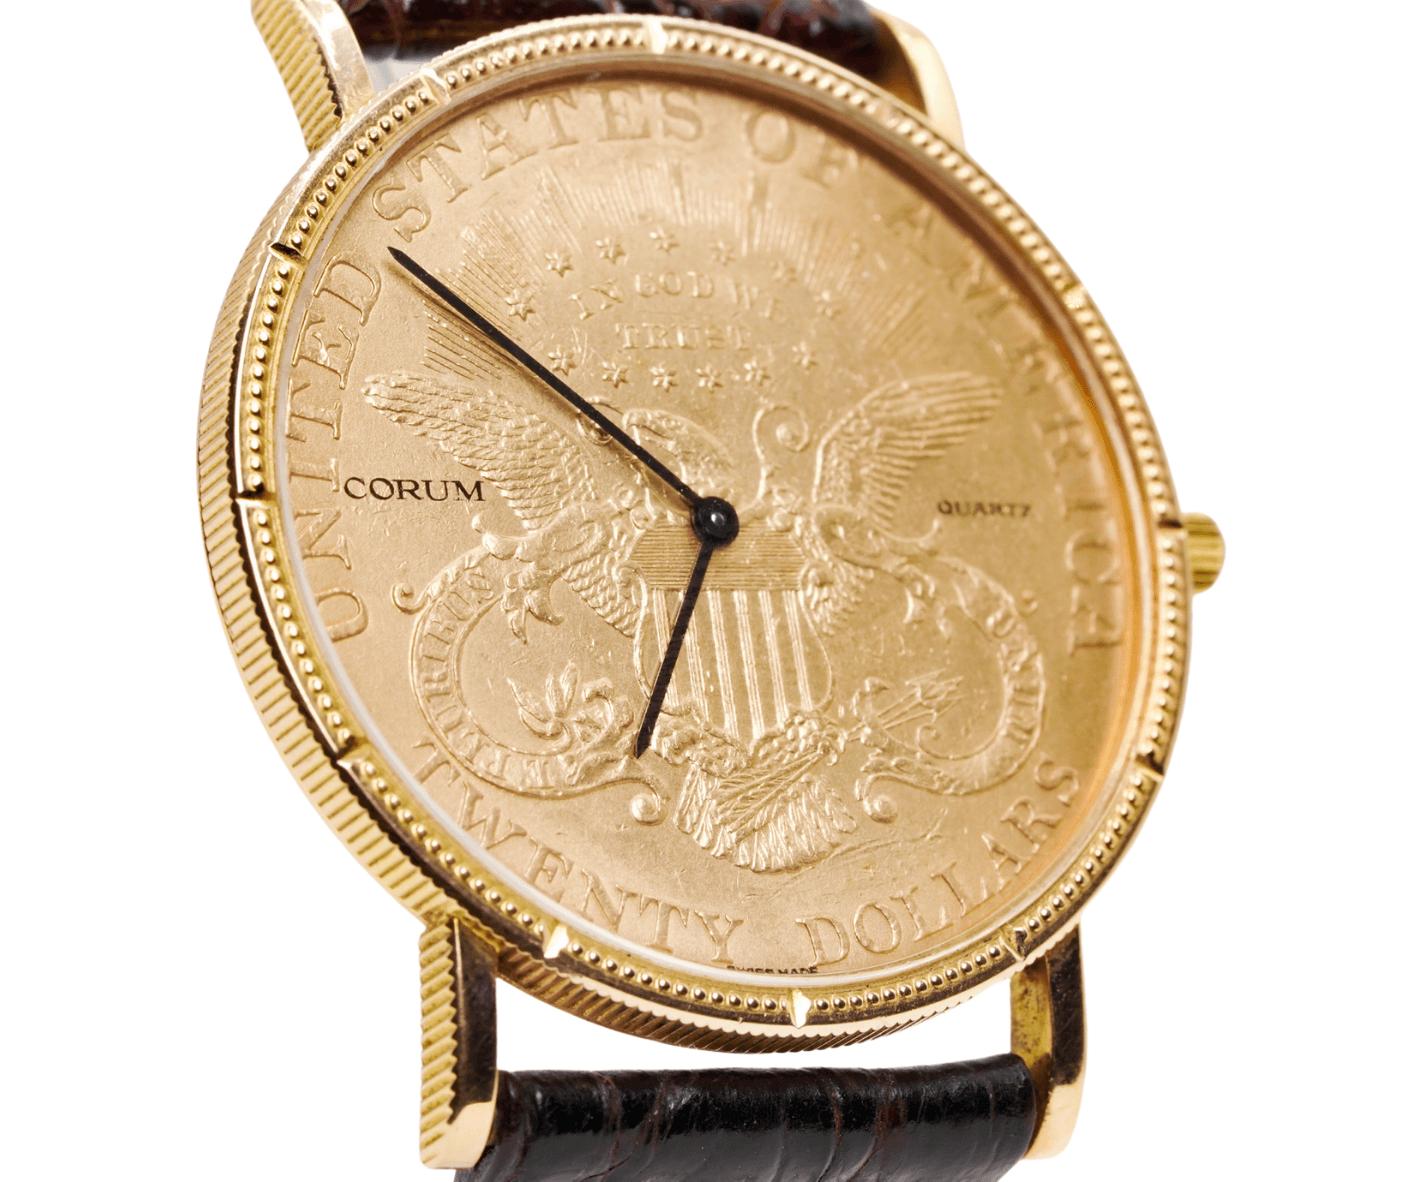 Men's Corum 1882 $20 Gold Coin Wrist Watch